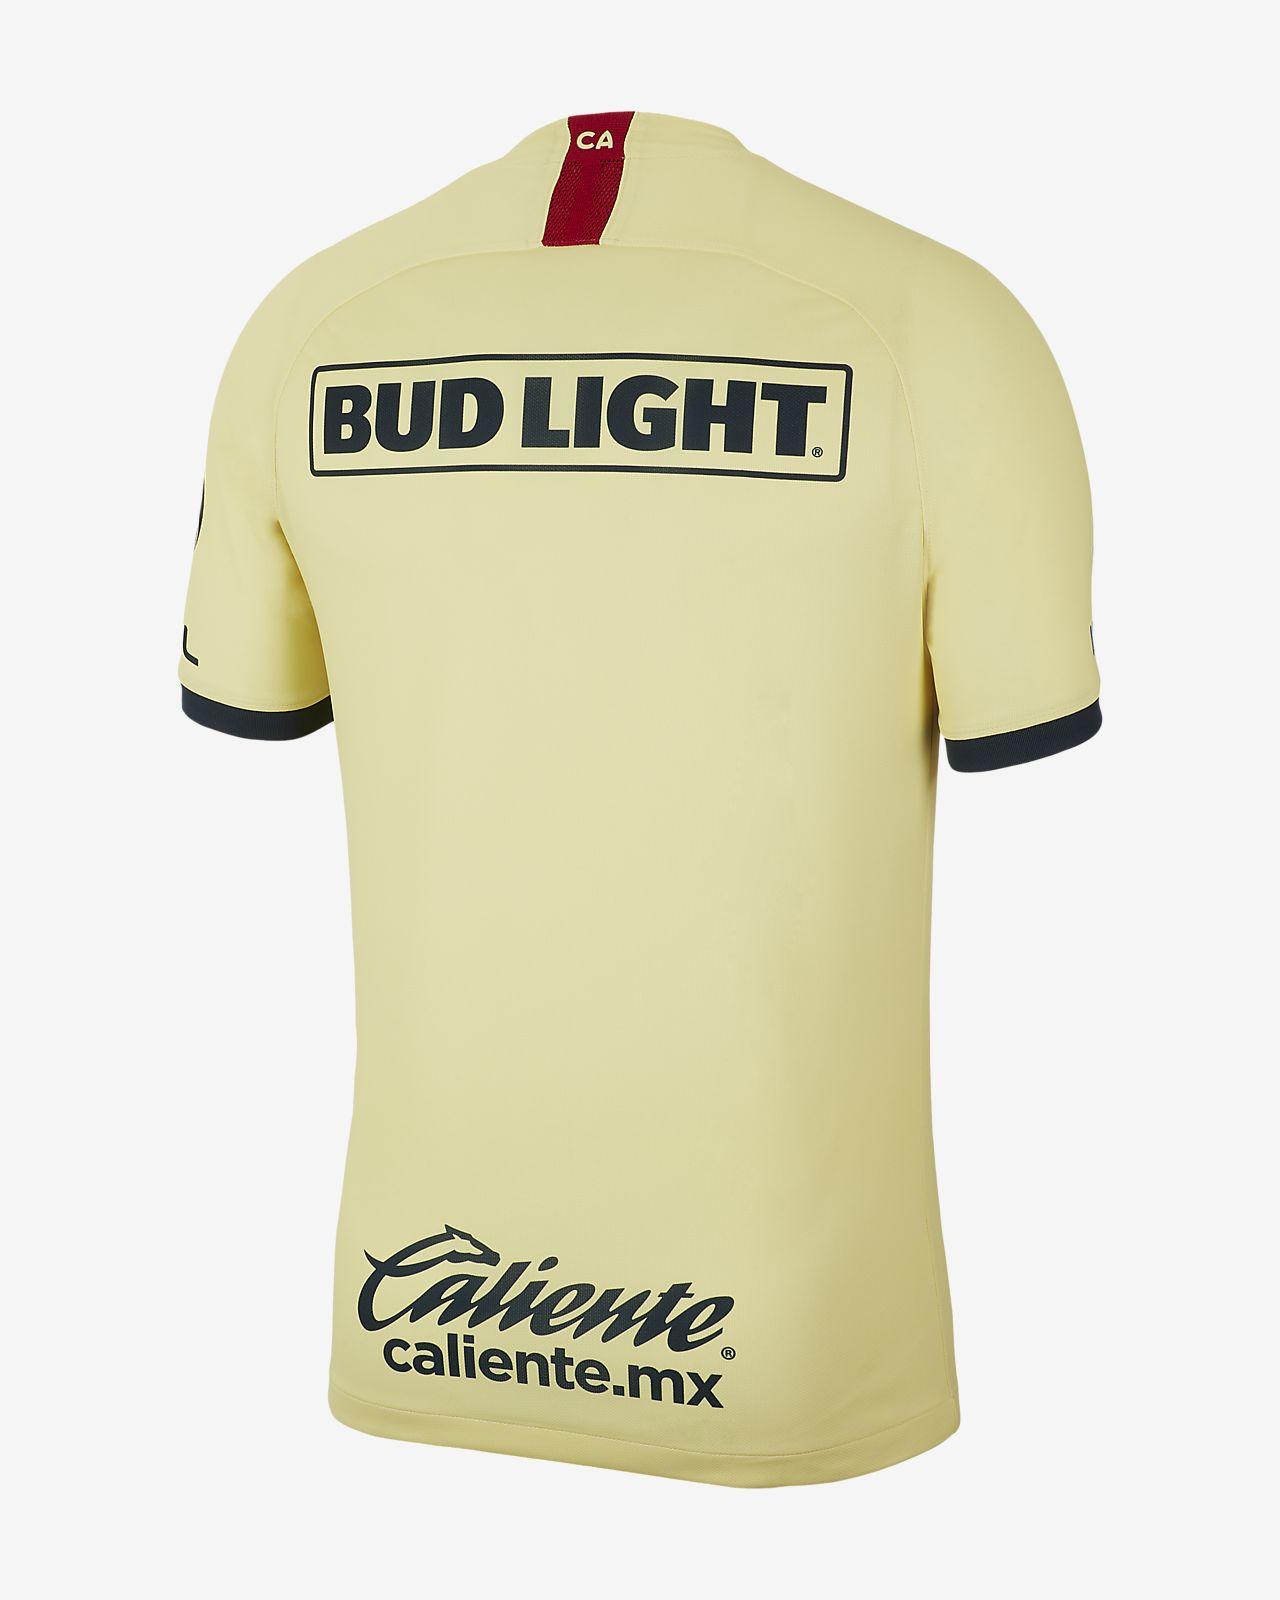 new styles 2575b 8d4e1 Camiseta de fútbol de local para hombre Stadium del Club América 2019/20